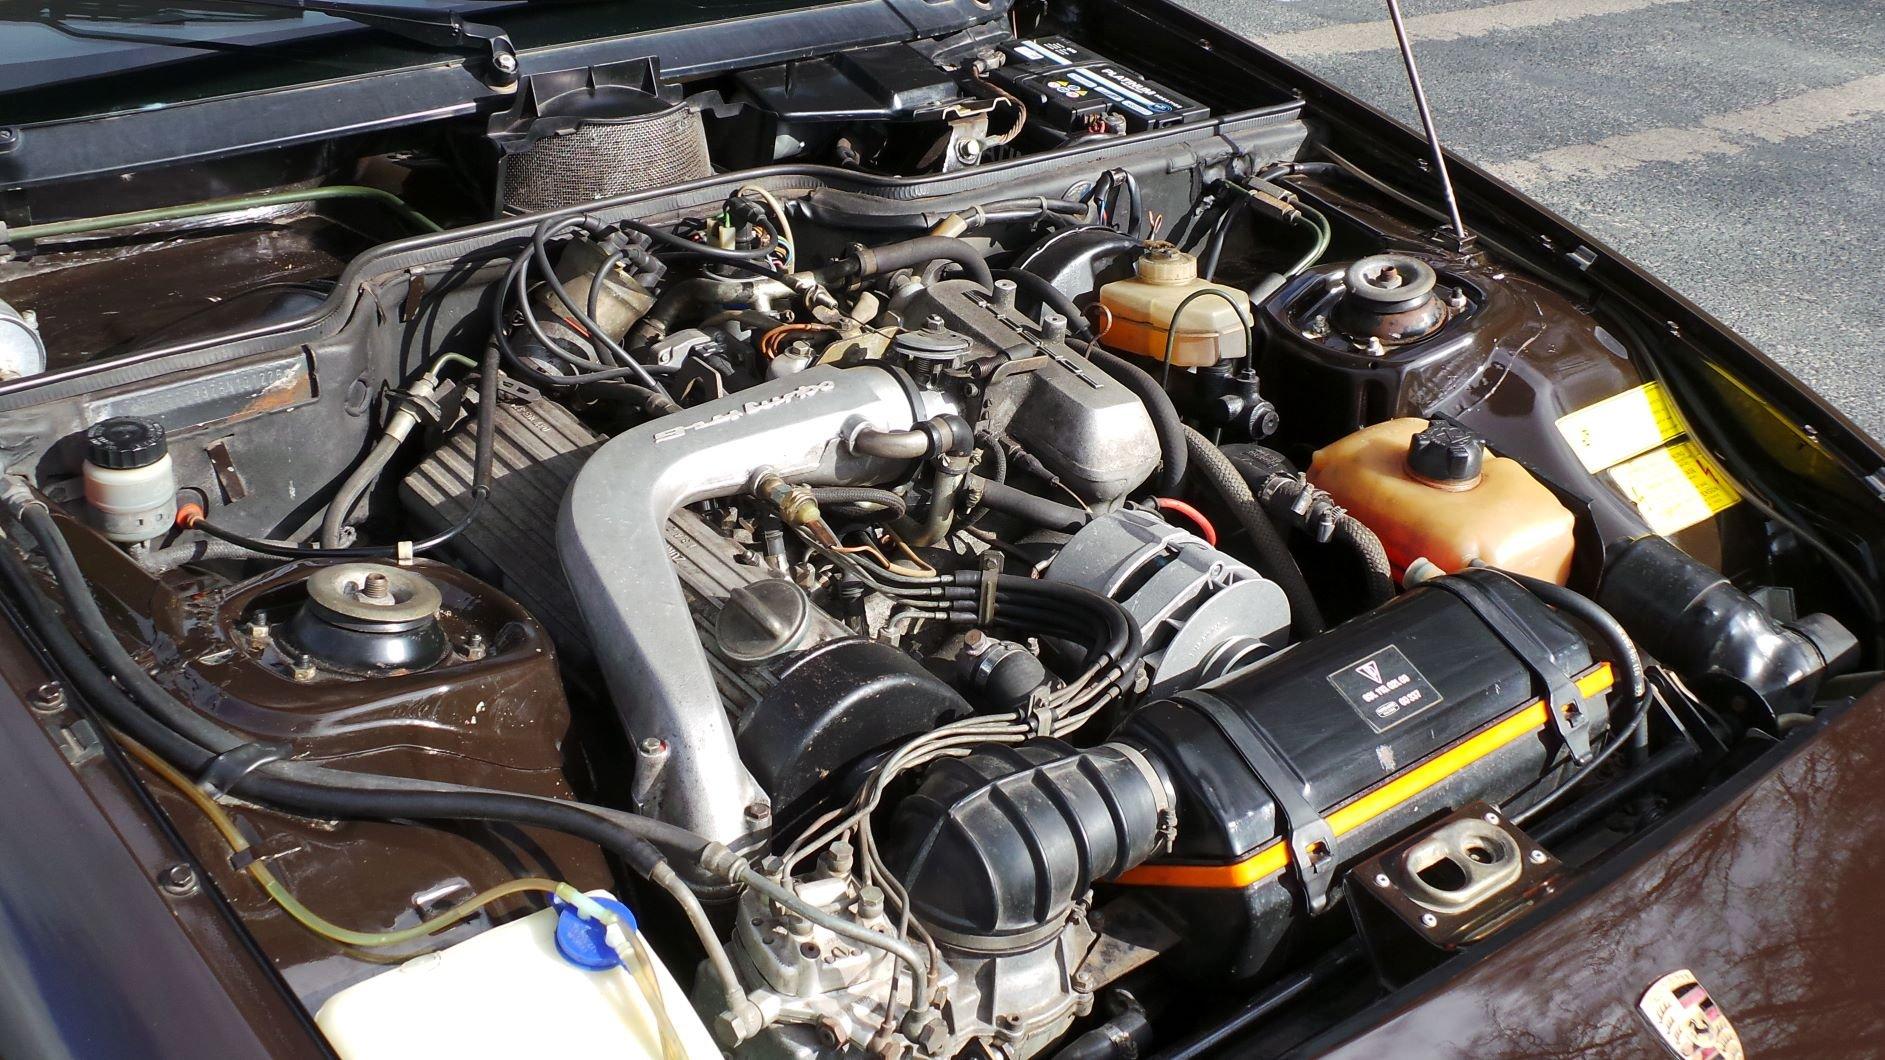 1981 Porsche 924 Turbo series 2 For Sale (picture 4 of 6)